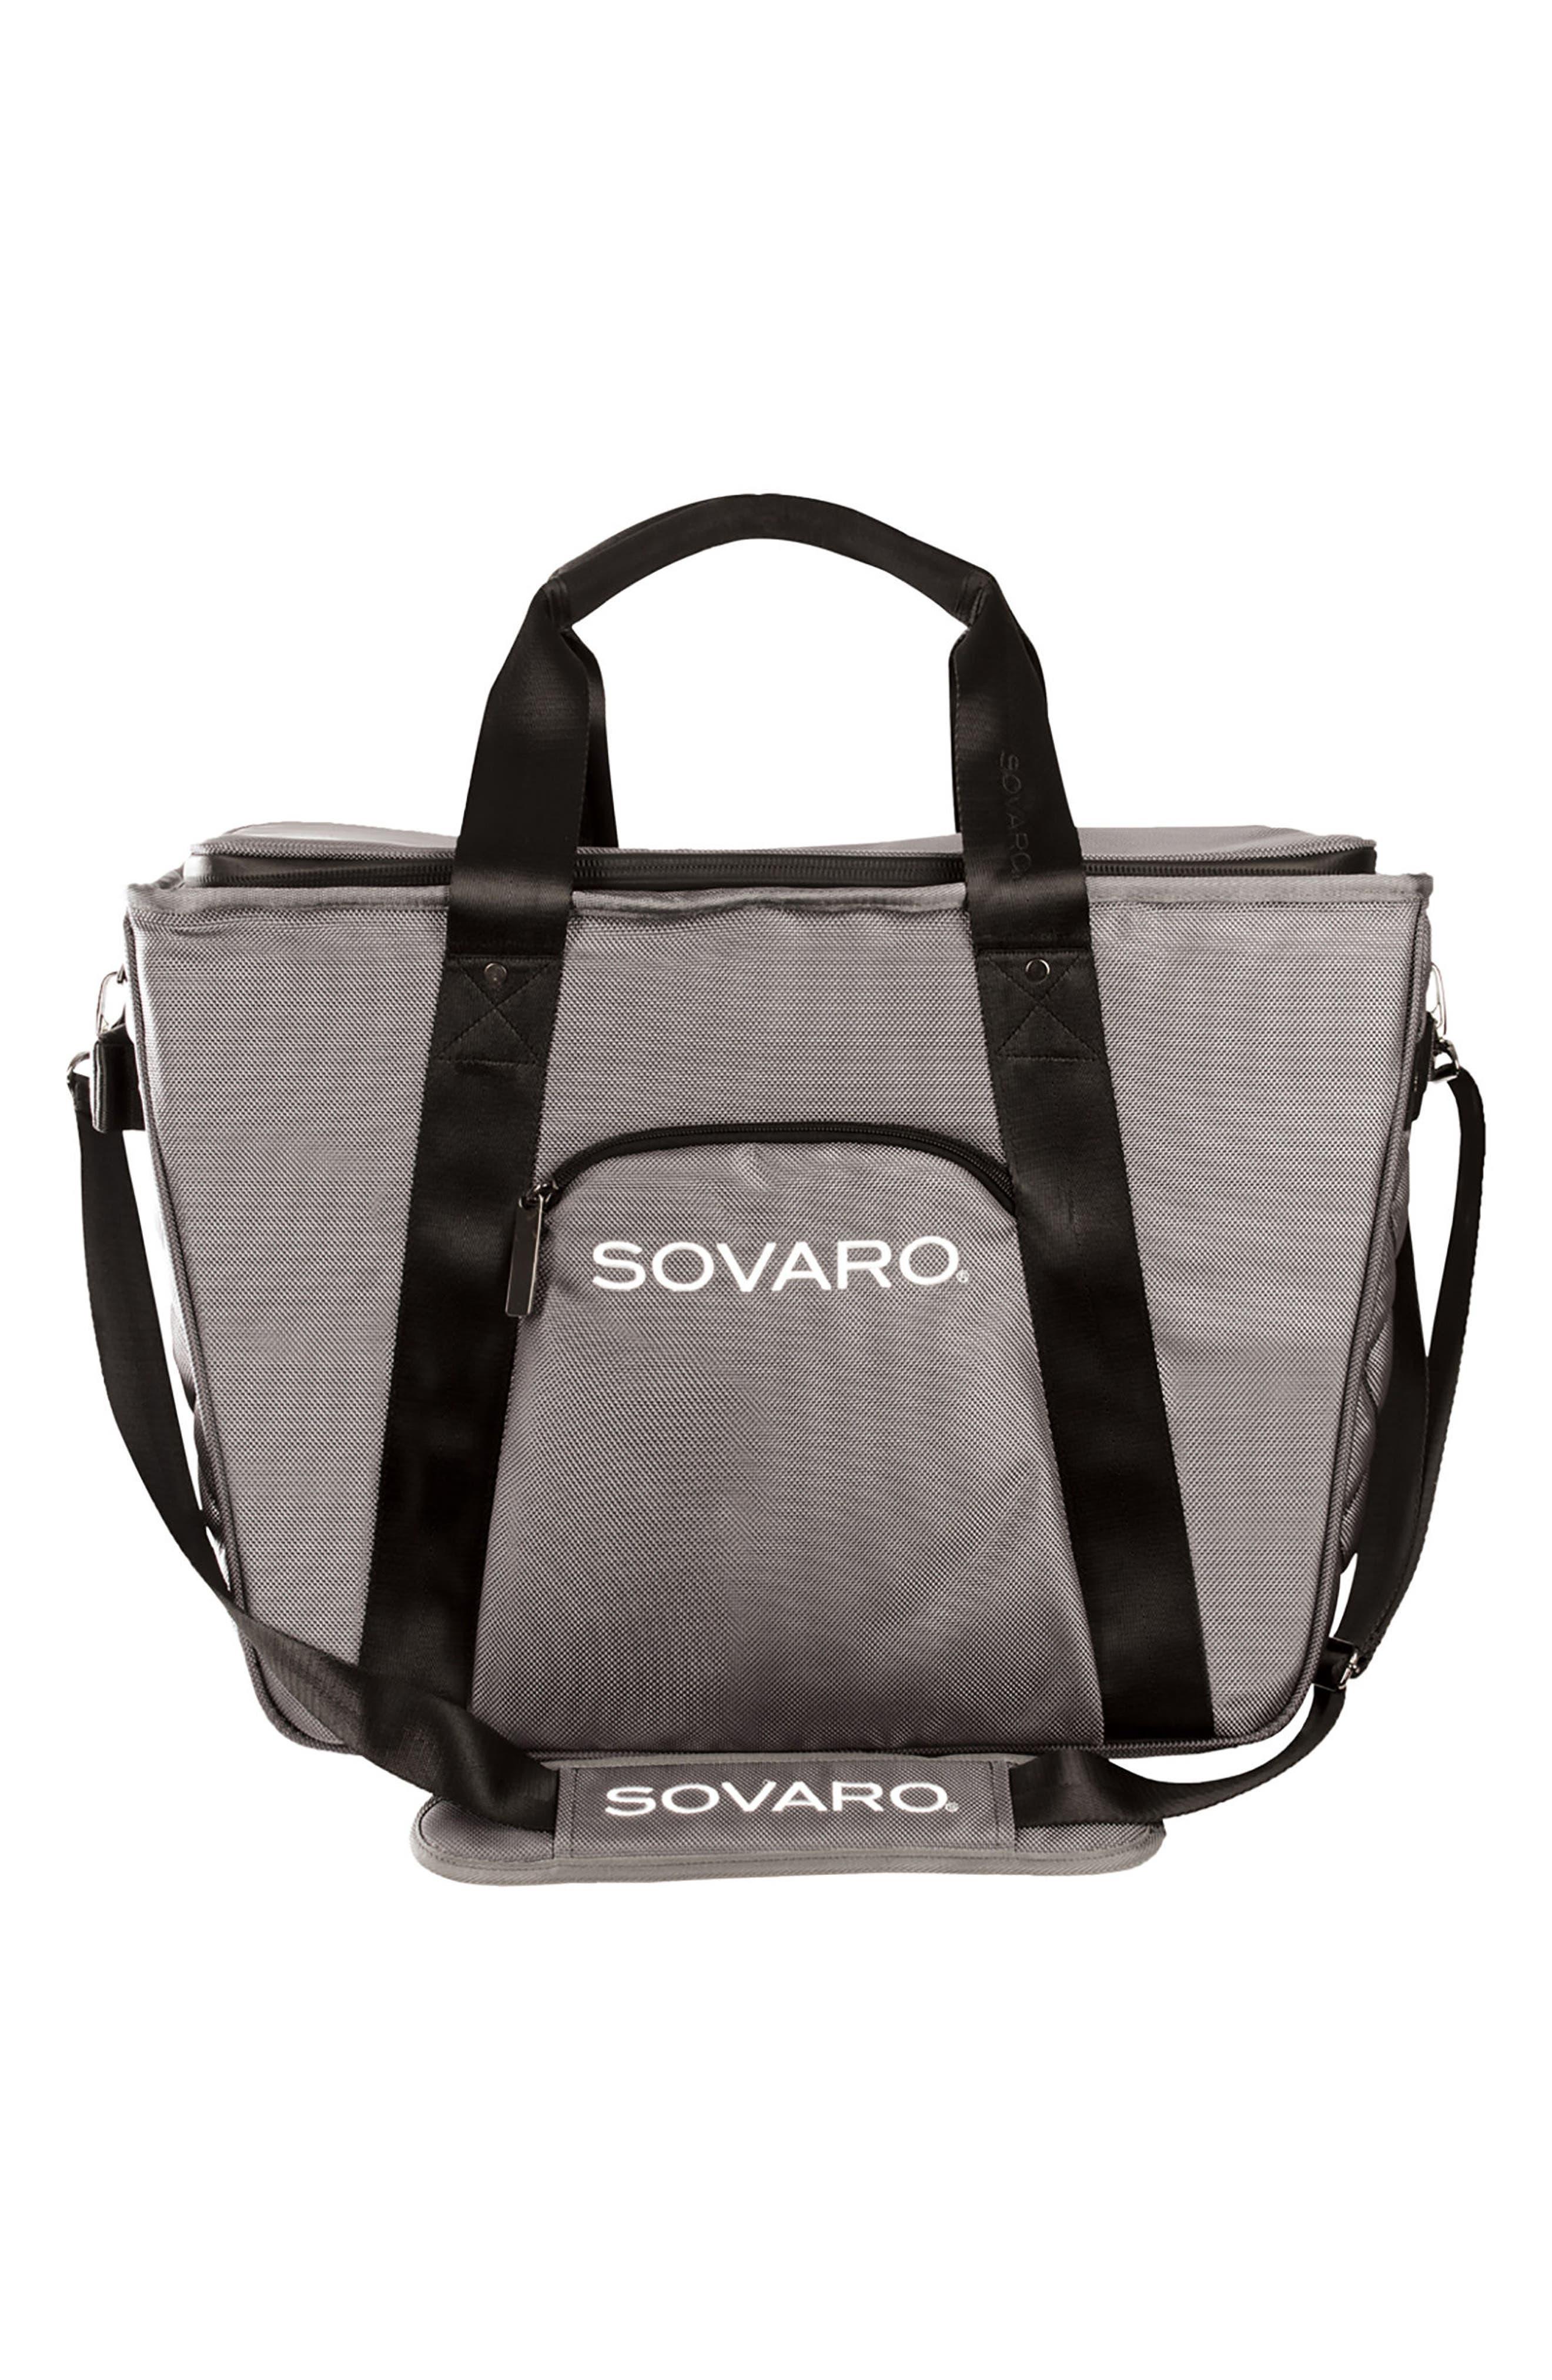 Sovaro 22-Inch Soft Sided Cooler